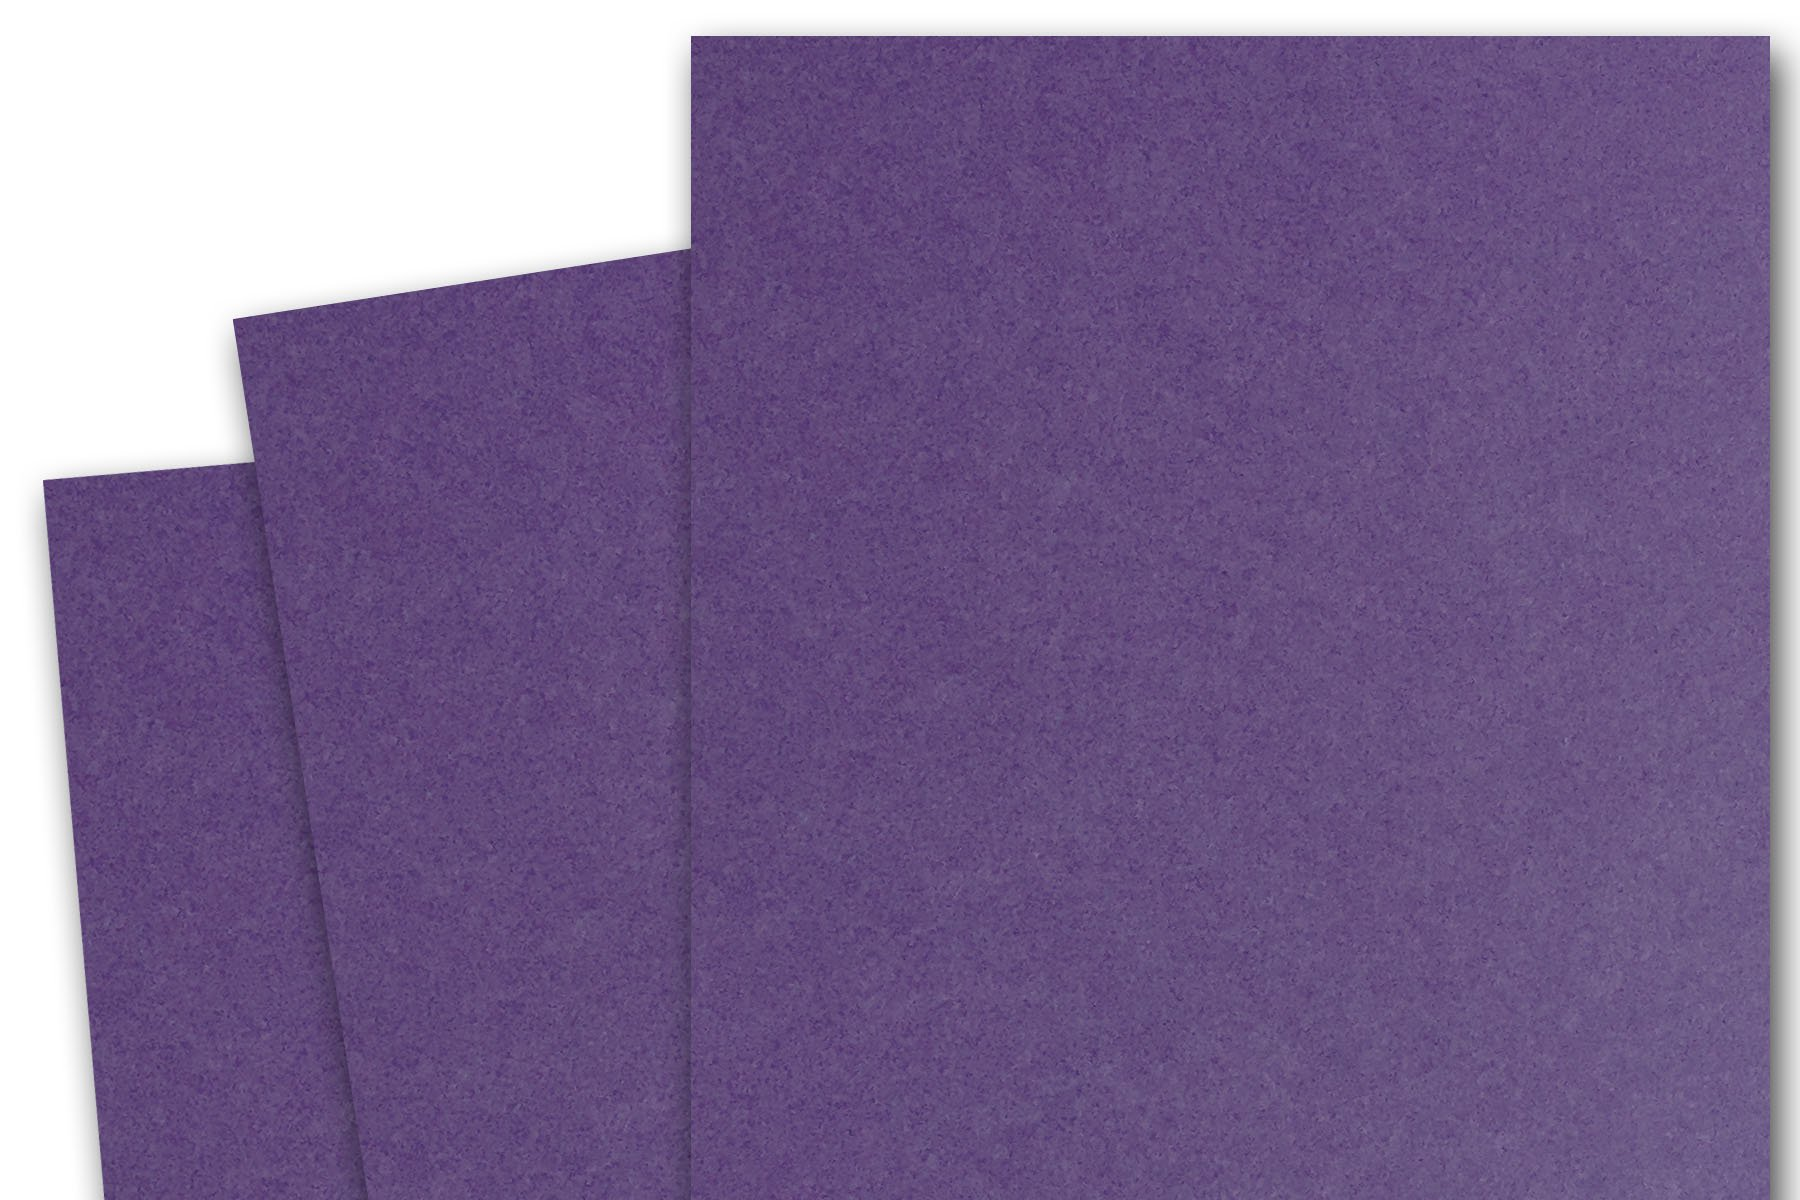 Blank Basic 4x6 Flat Card Invitations (250 Pack, Dark Purple)